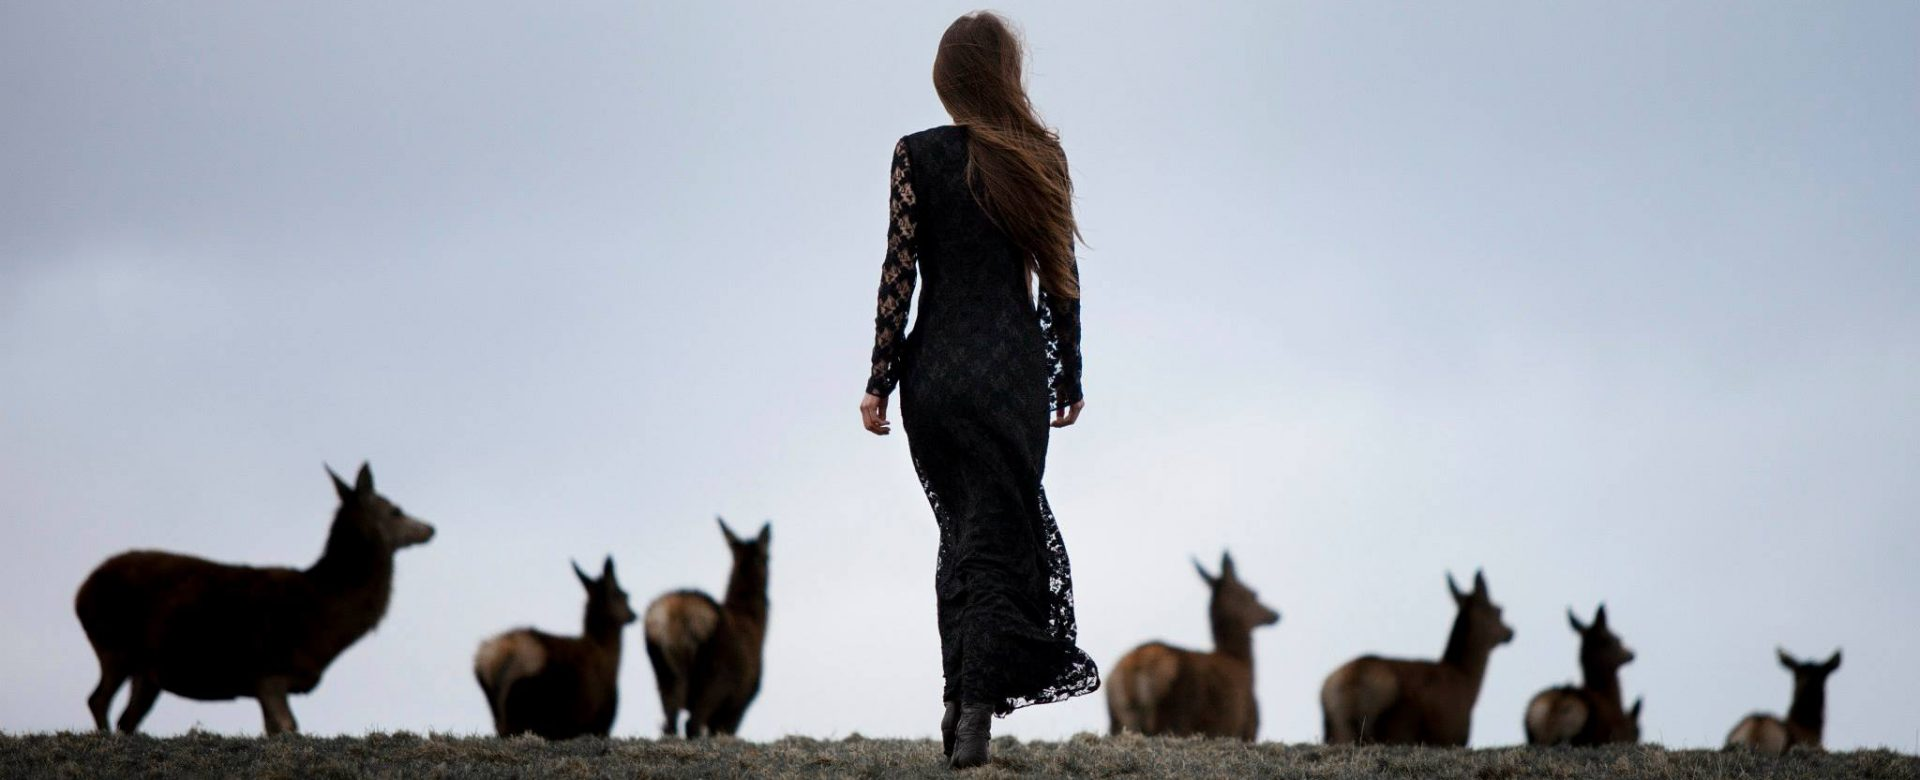 FUNERAL 'Modest' dress on Urszula Prokop, shot by Photobara, Makeup by Yvonne Lynch